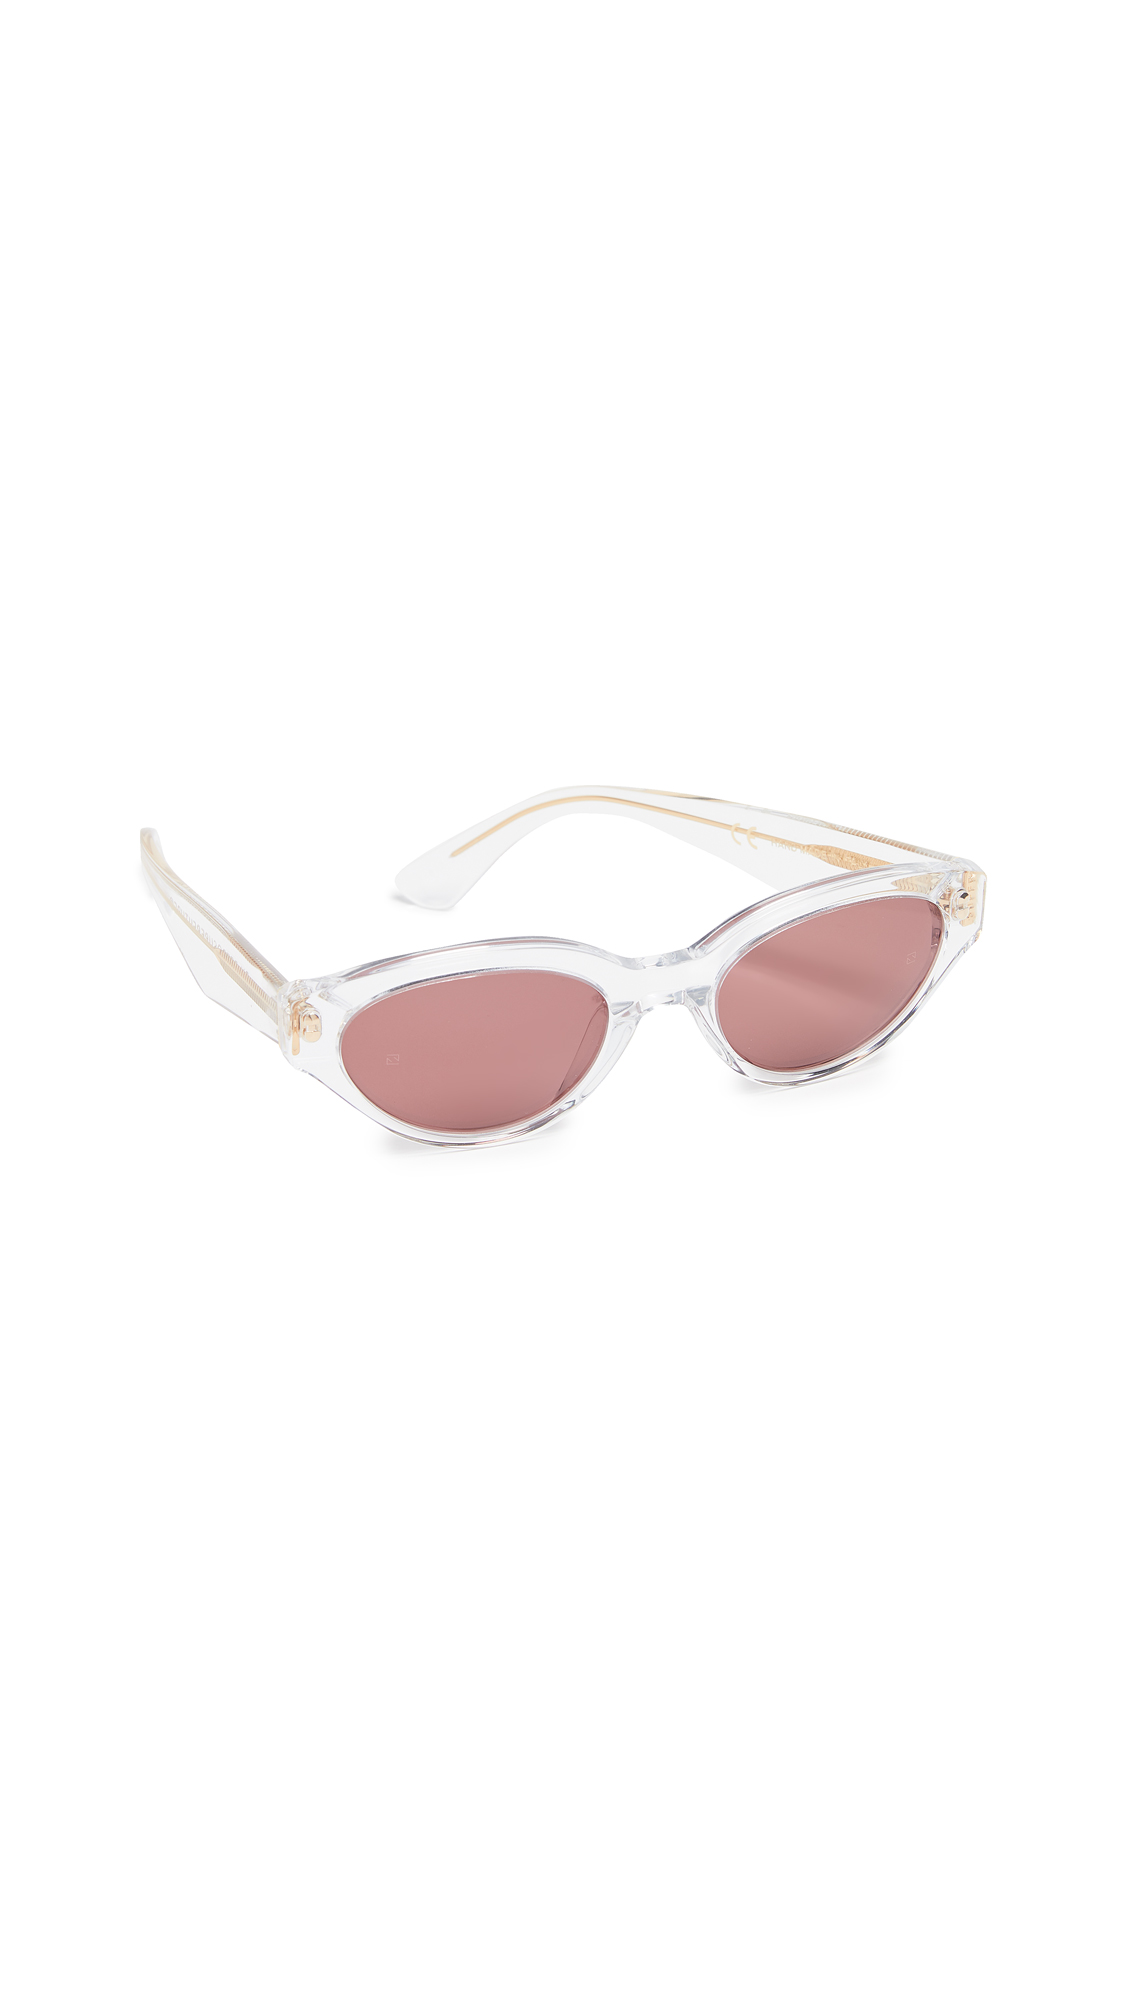 SUPER SUNGLASSES Drew Sunglasses in Crystal